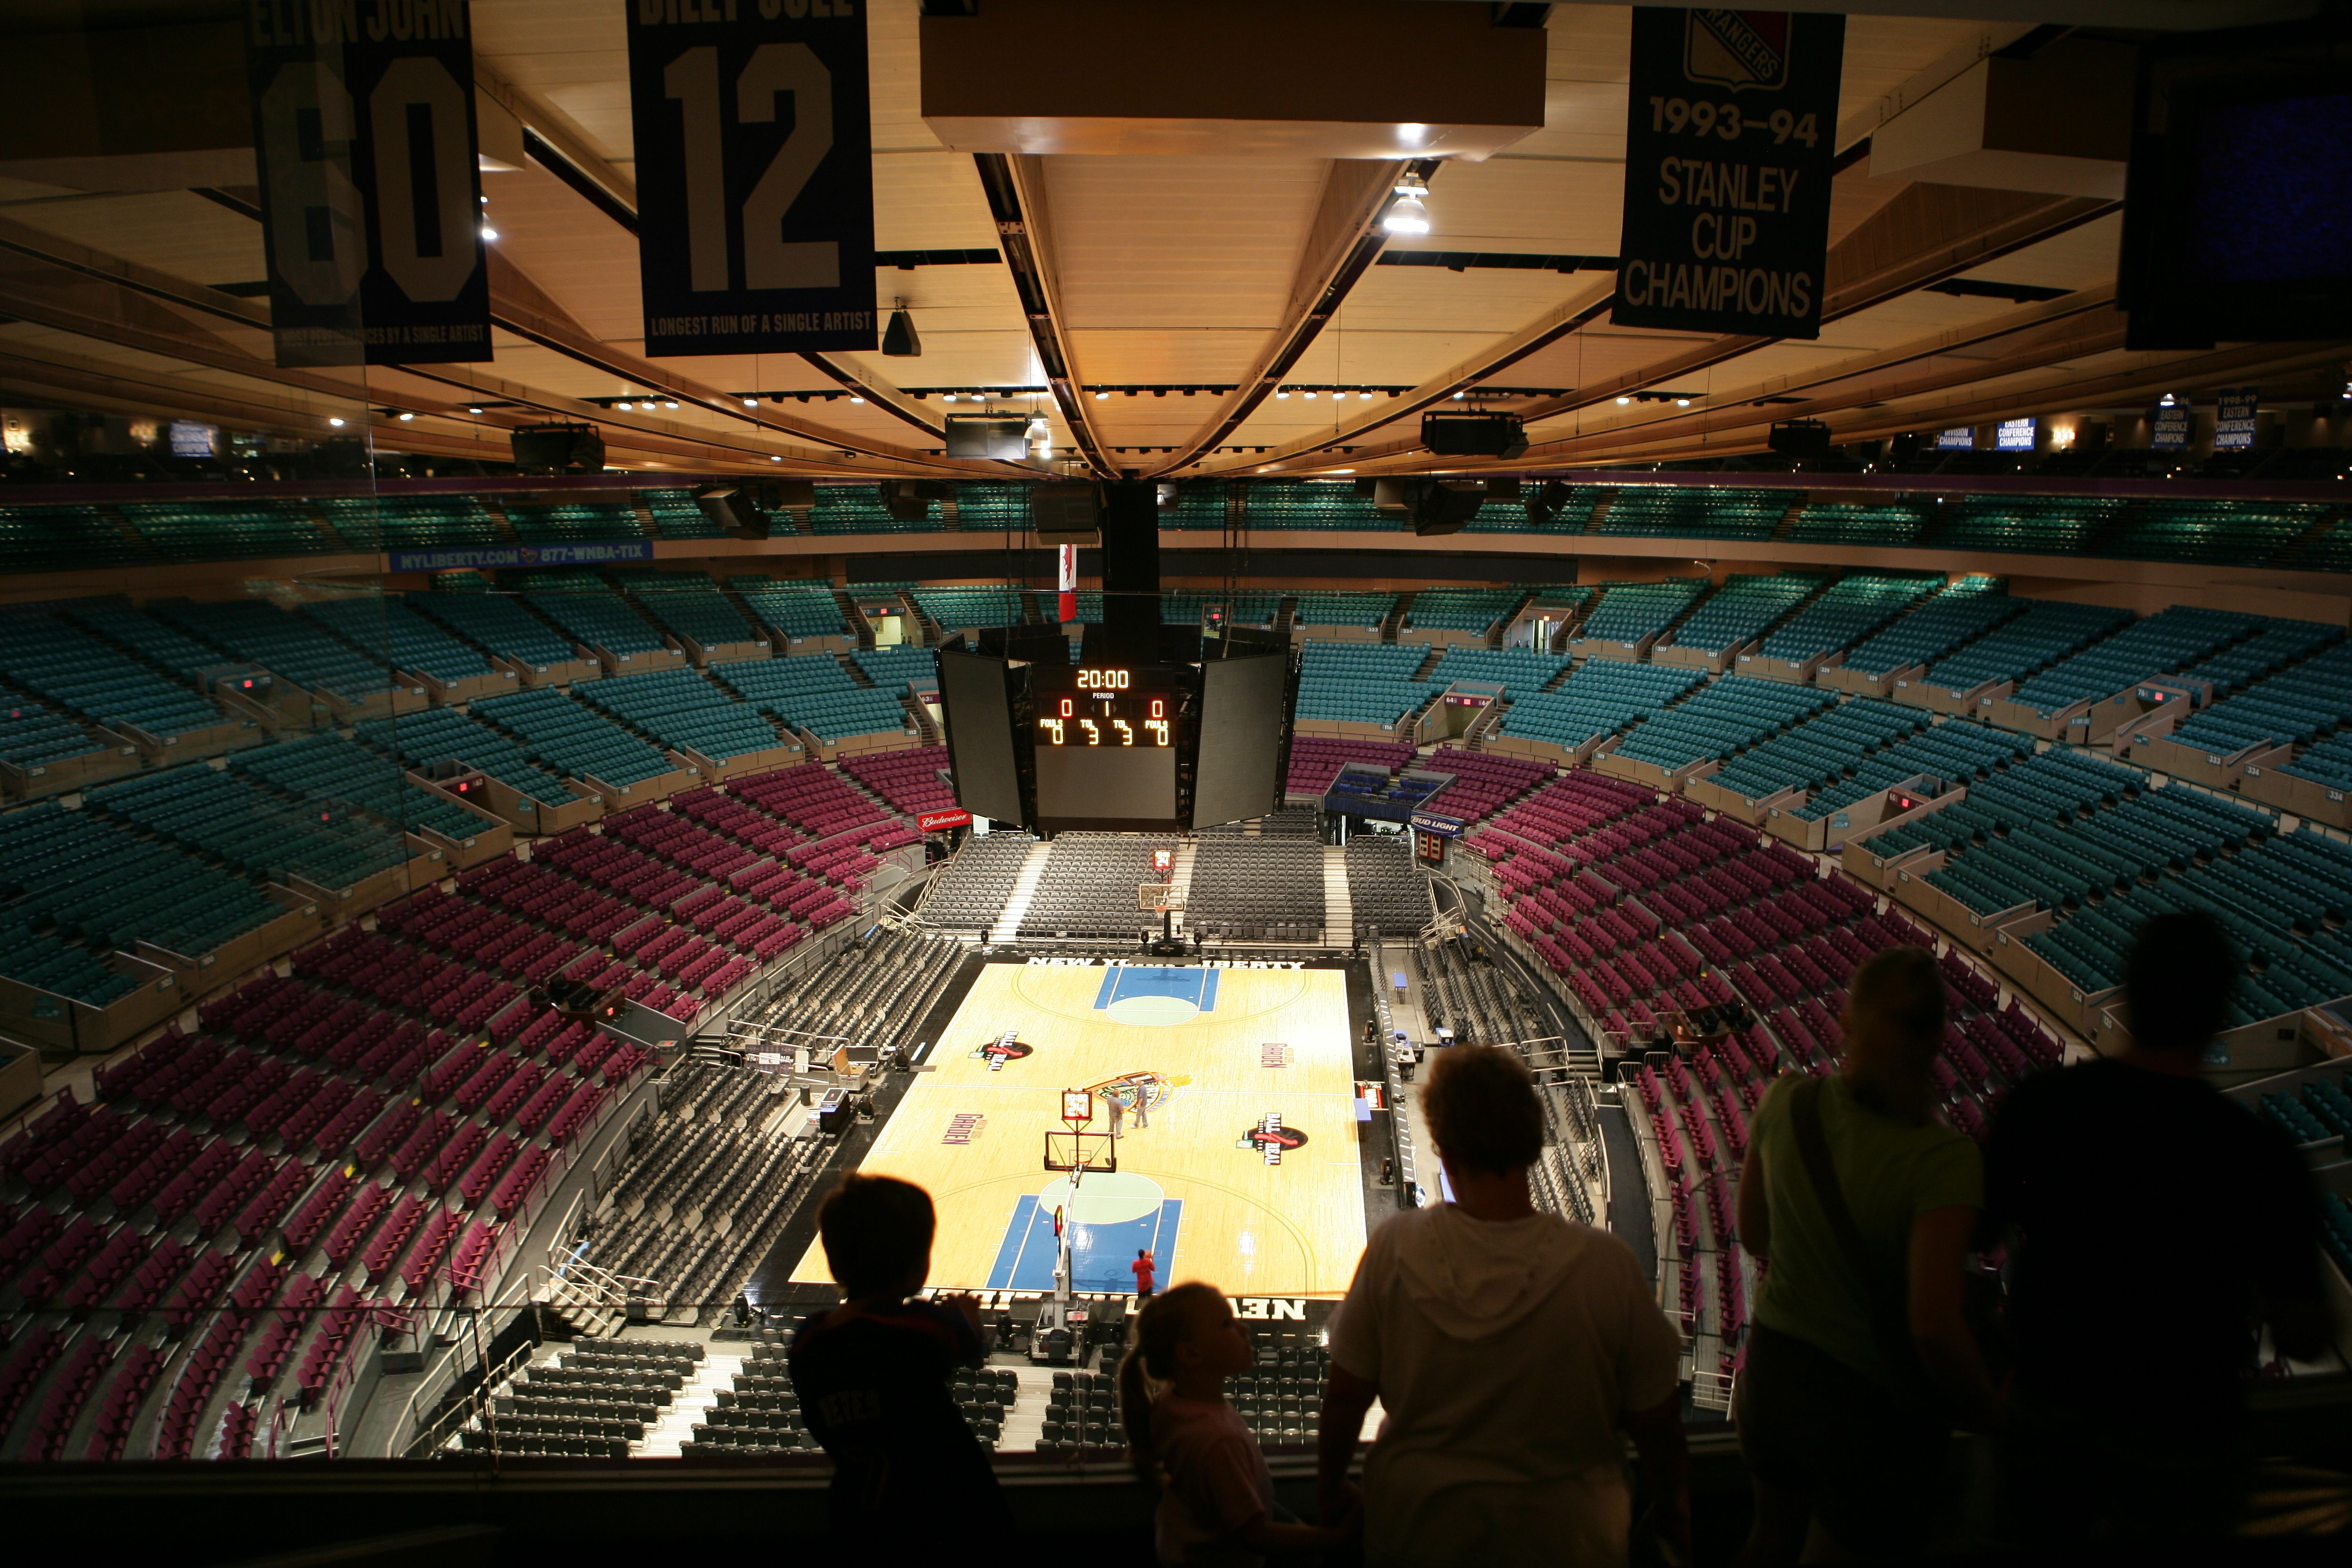 Madison Square Garden Google Search 1030 Sports Pinterest Madison Square Garden